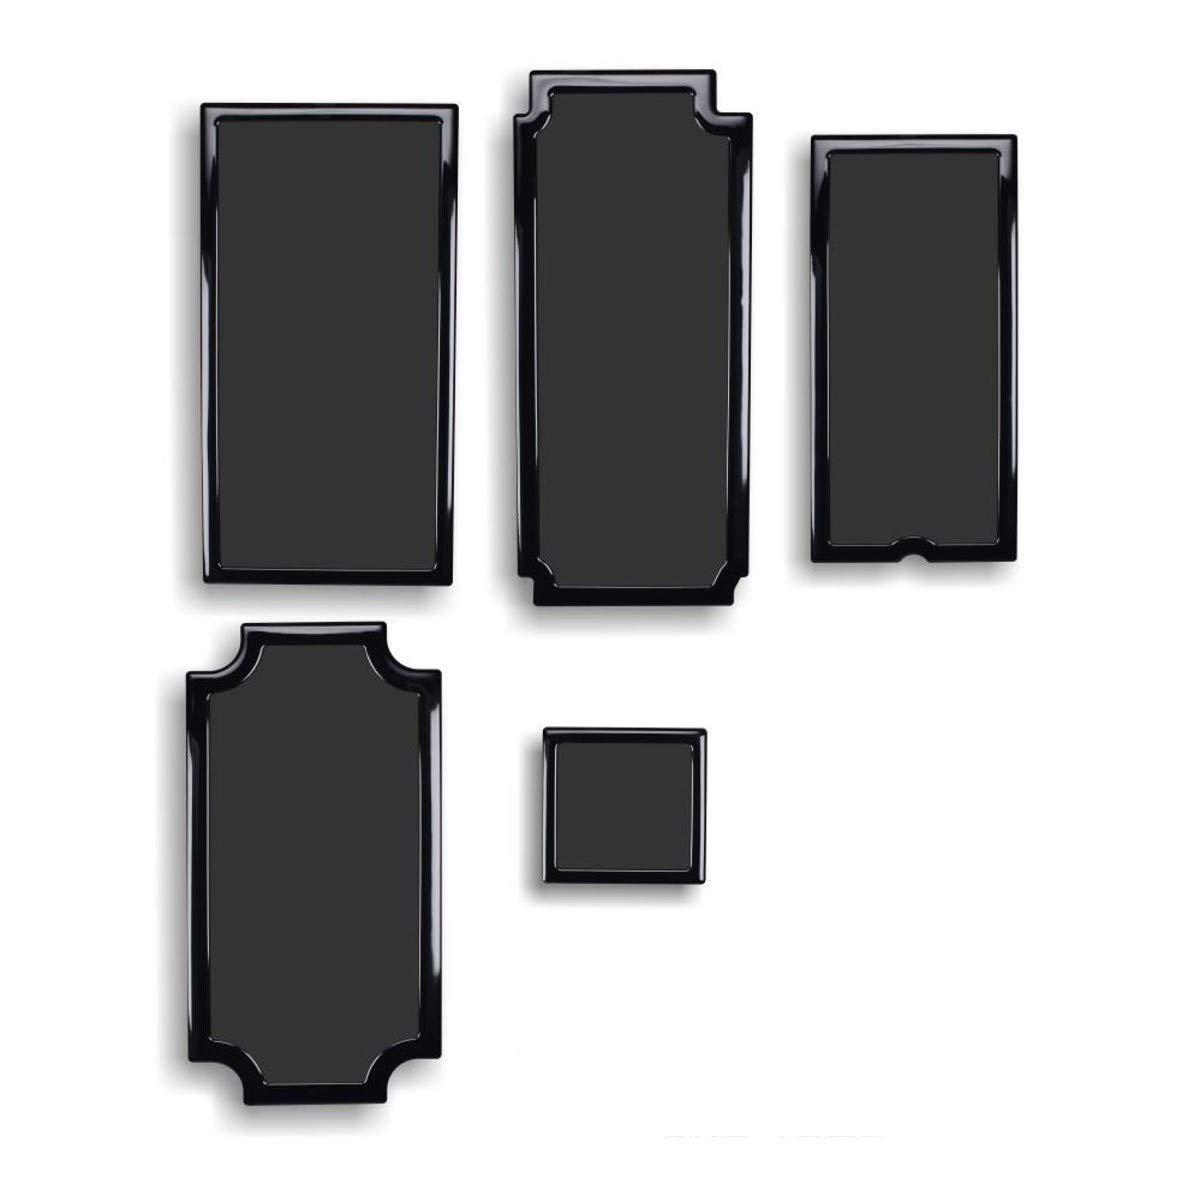 DEMCiflex Dust Filter Kit for Sliger Cerberus X Filter Kit (Case Without Handle)